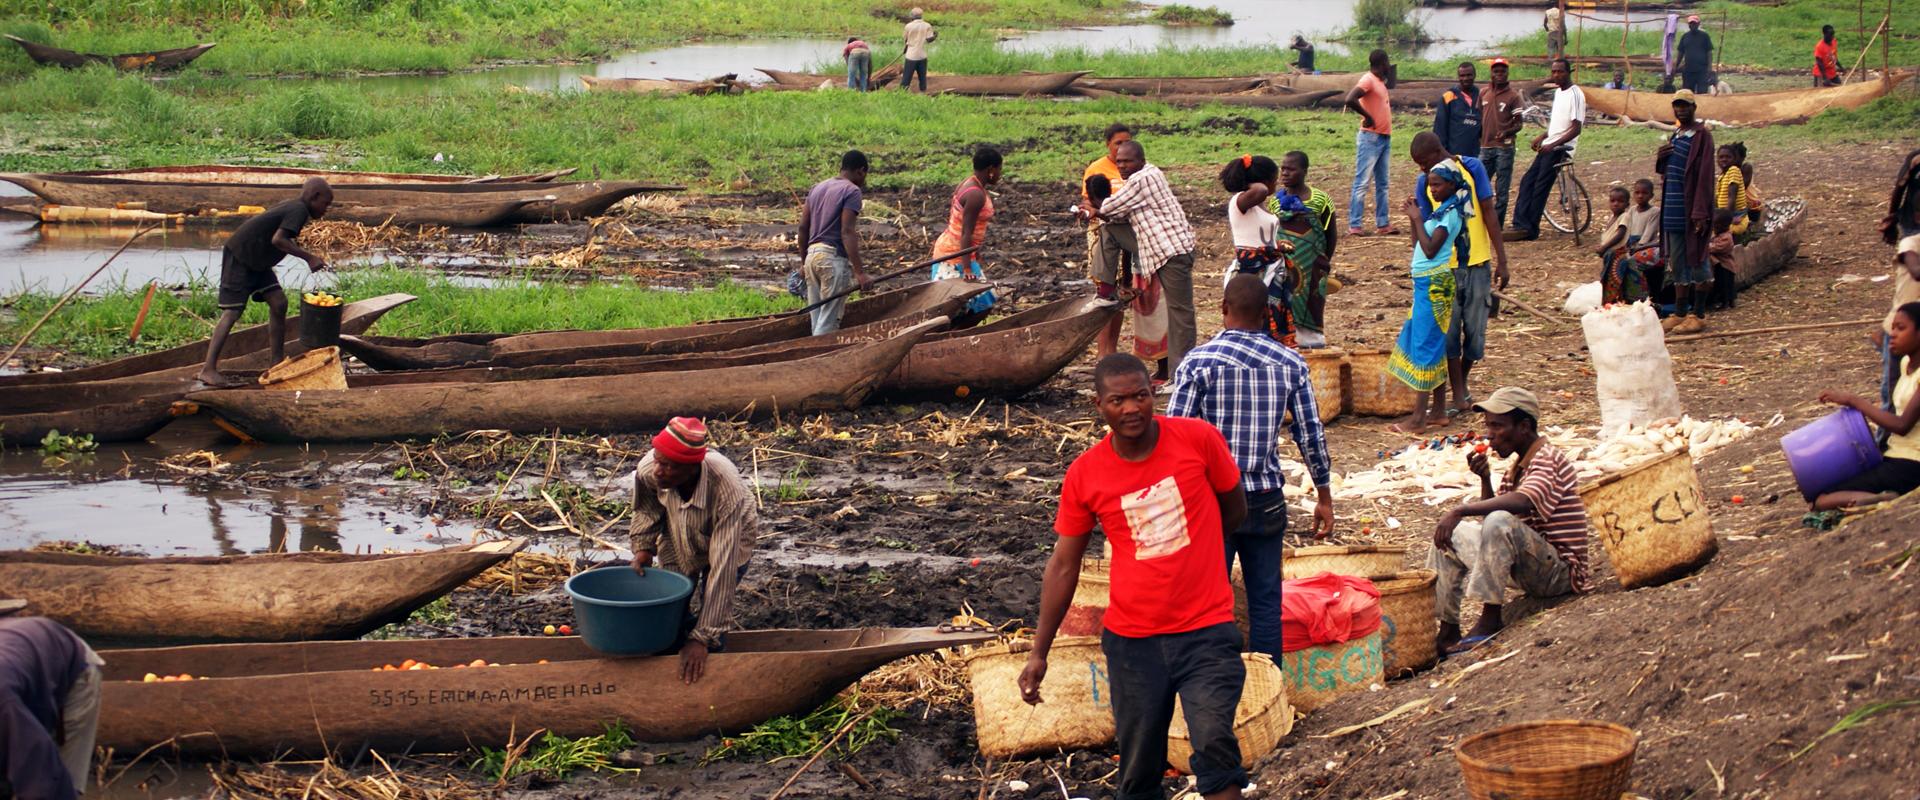 Incontri in pescatori indiana